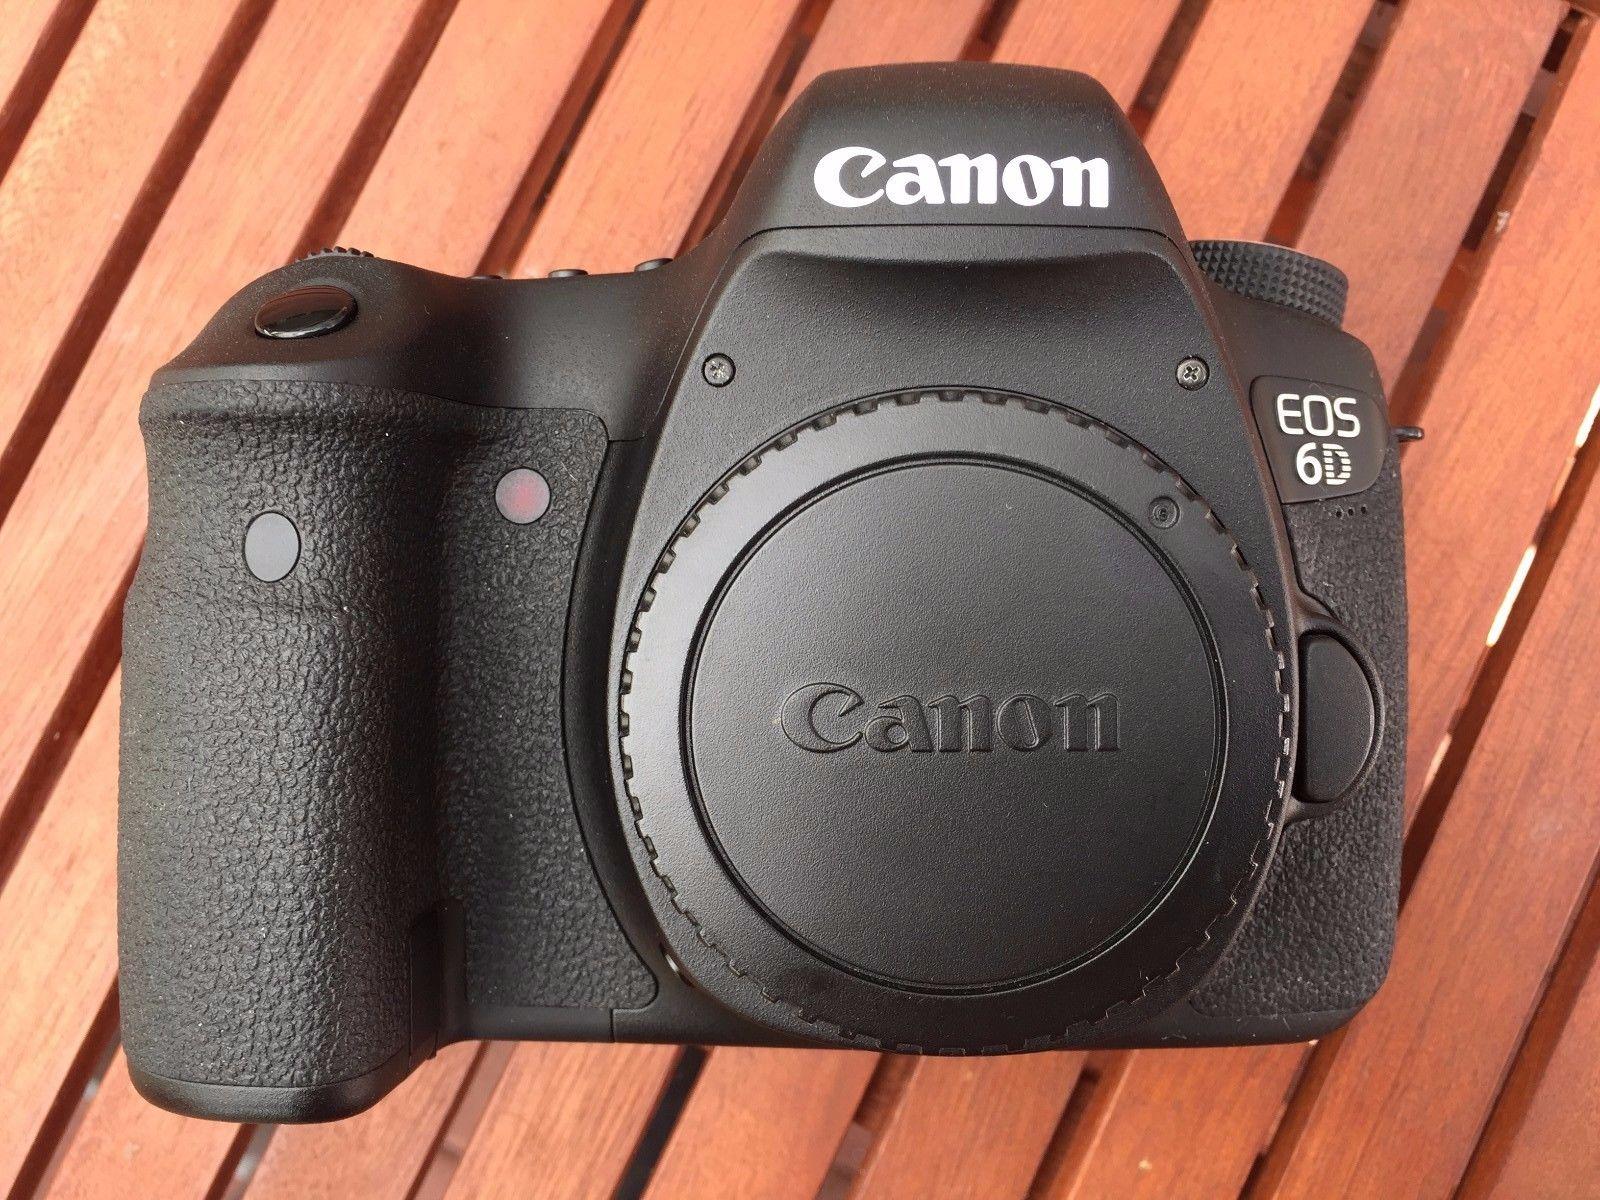 Canon EOS 6D 20.2MP Digitalkamera  !!! 921 Auslösungen !!!